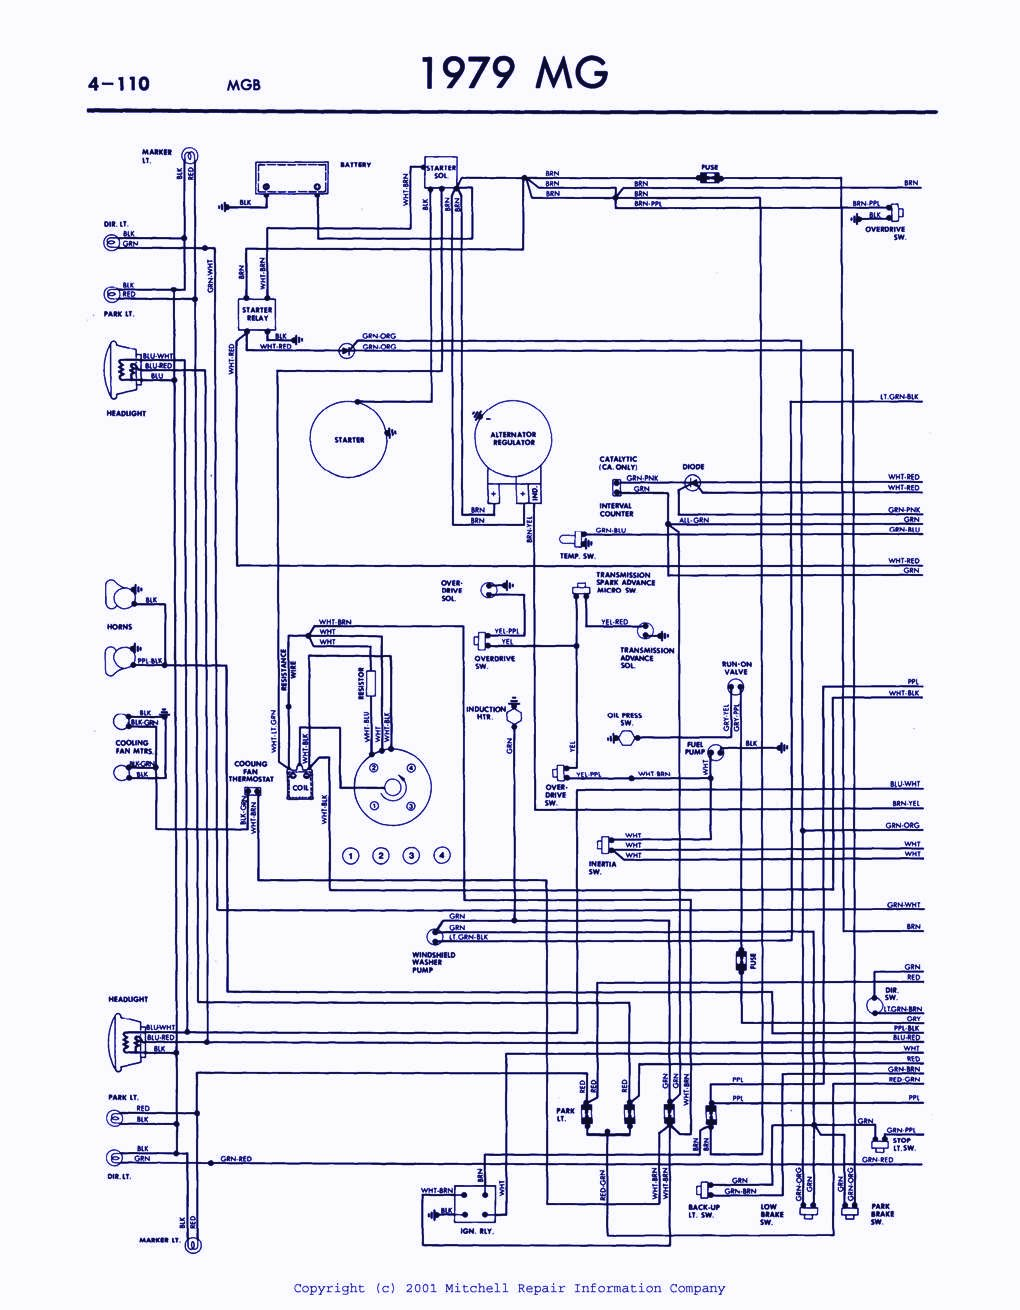 hight resolution of 1976 mgb engine diagram wiring diagram yer mgb engine parts diagram 1976 mgb engine diagram wiring